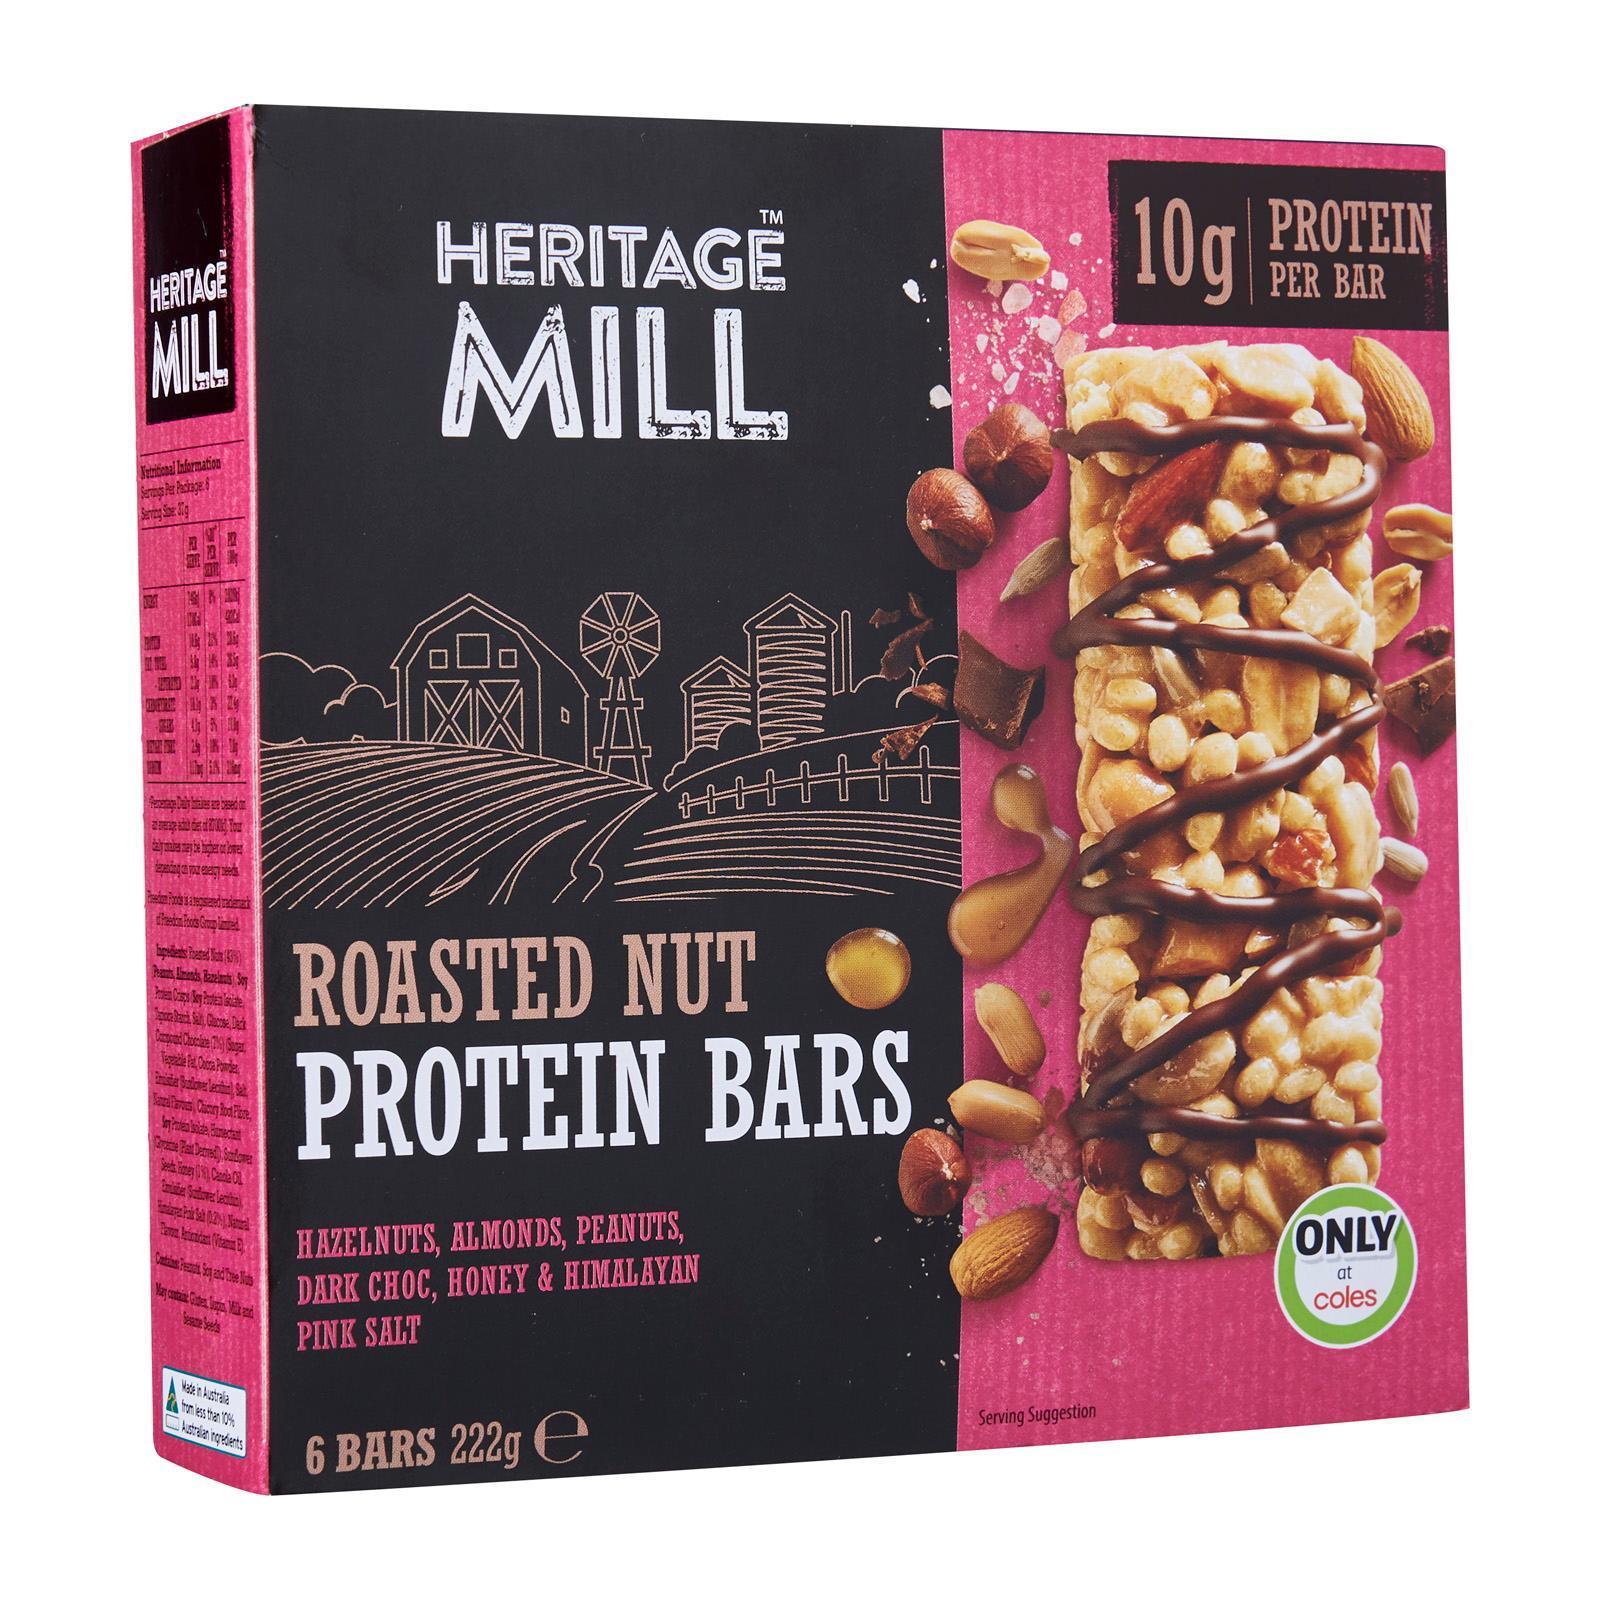 Freedom Foods Heritage Mill Roasted Nut Protein Bars